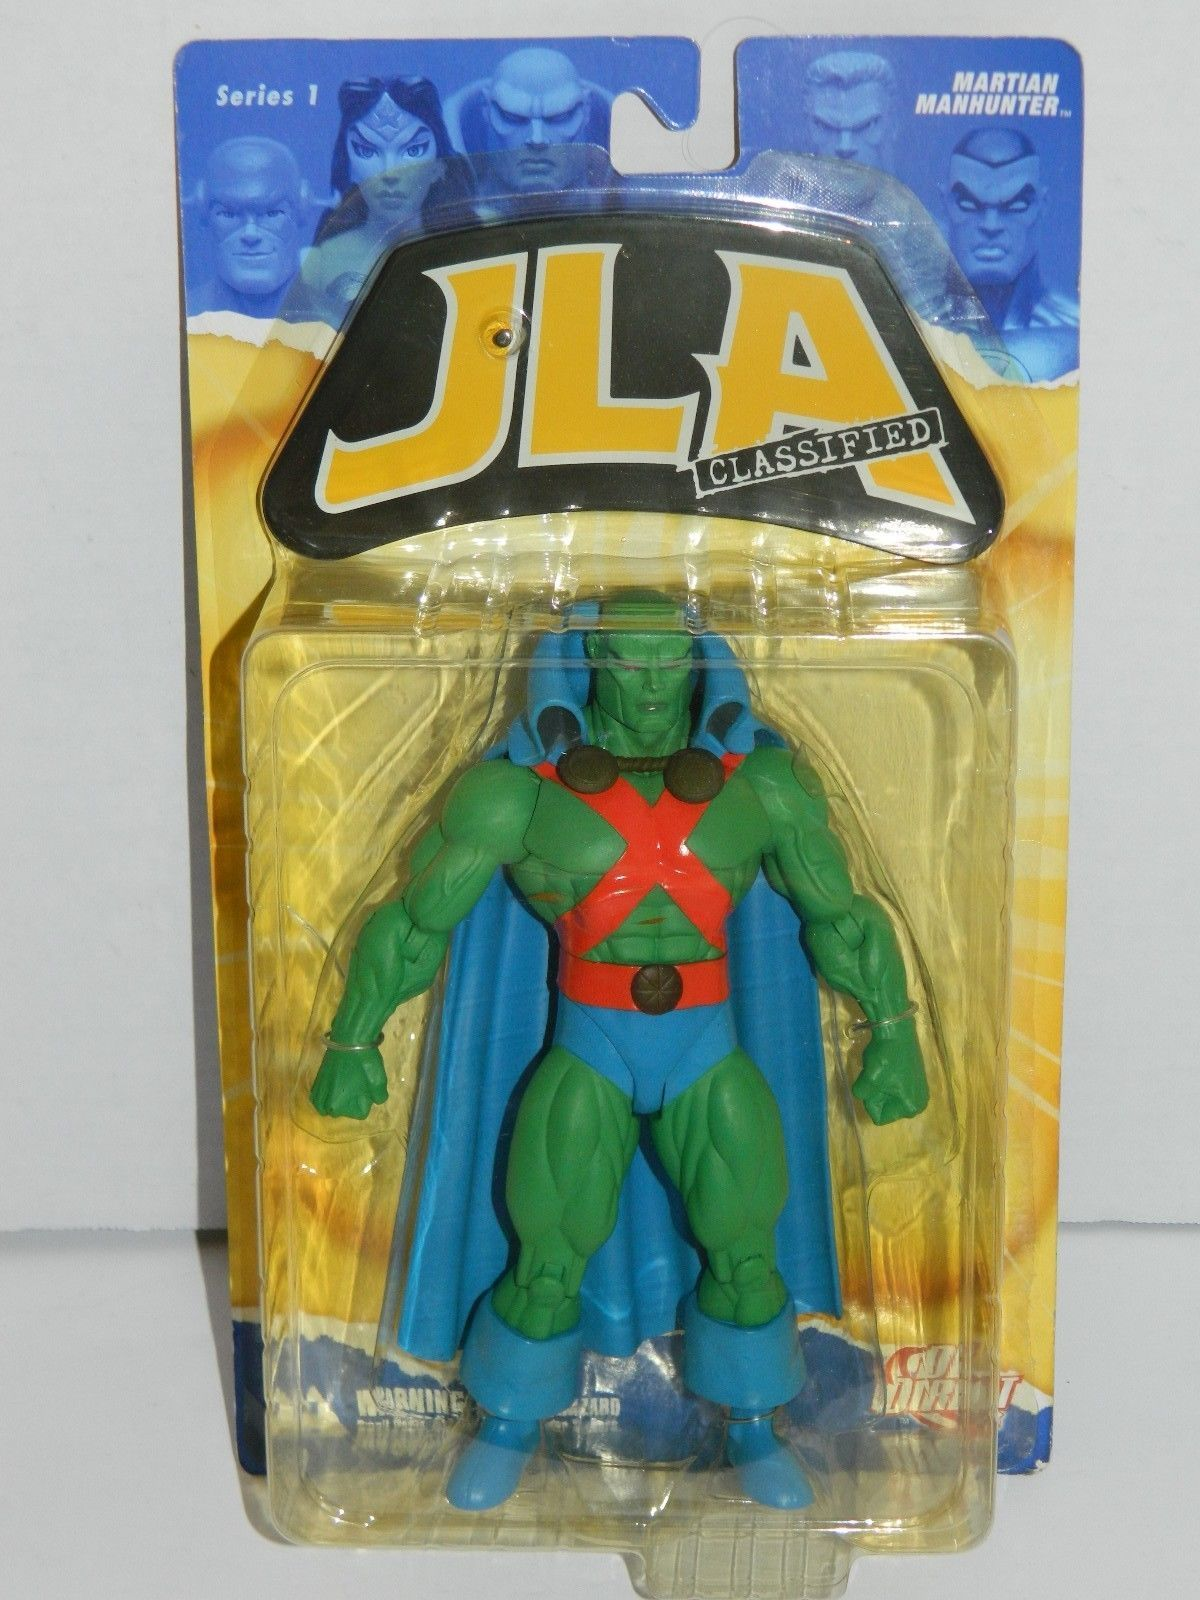 Justice League Alex Ross Series 5 Translucent Martian Manhunter Action Figure